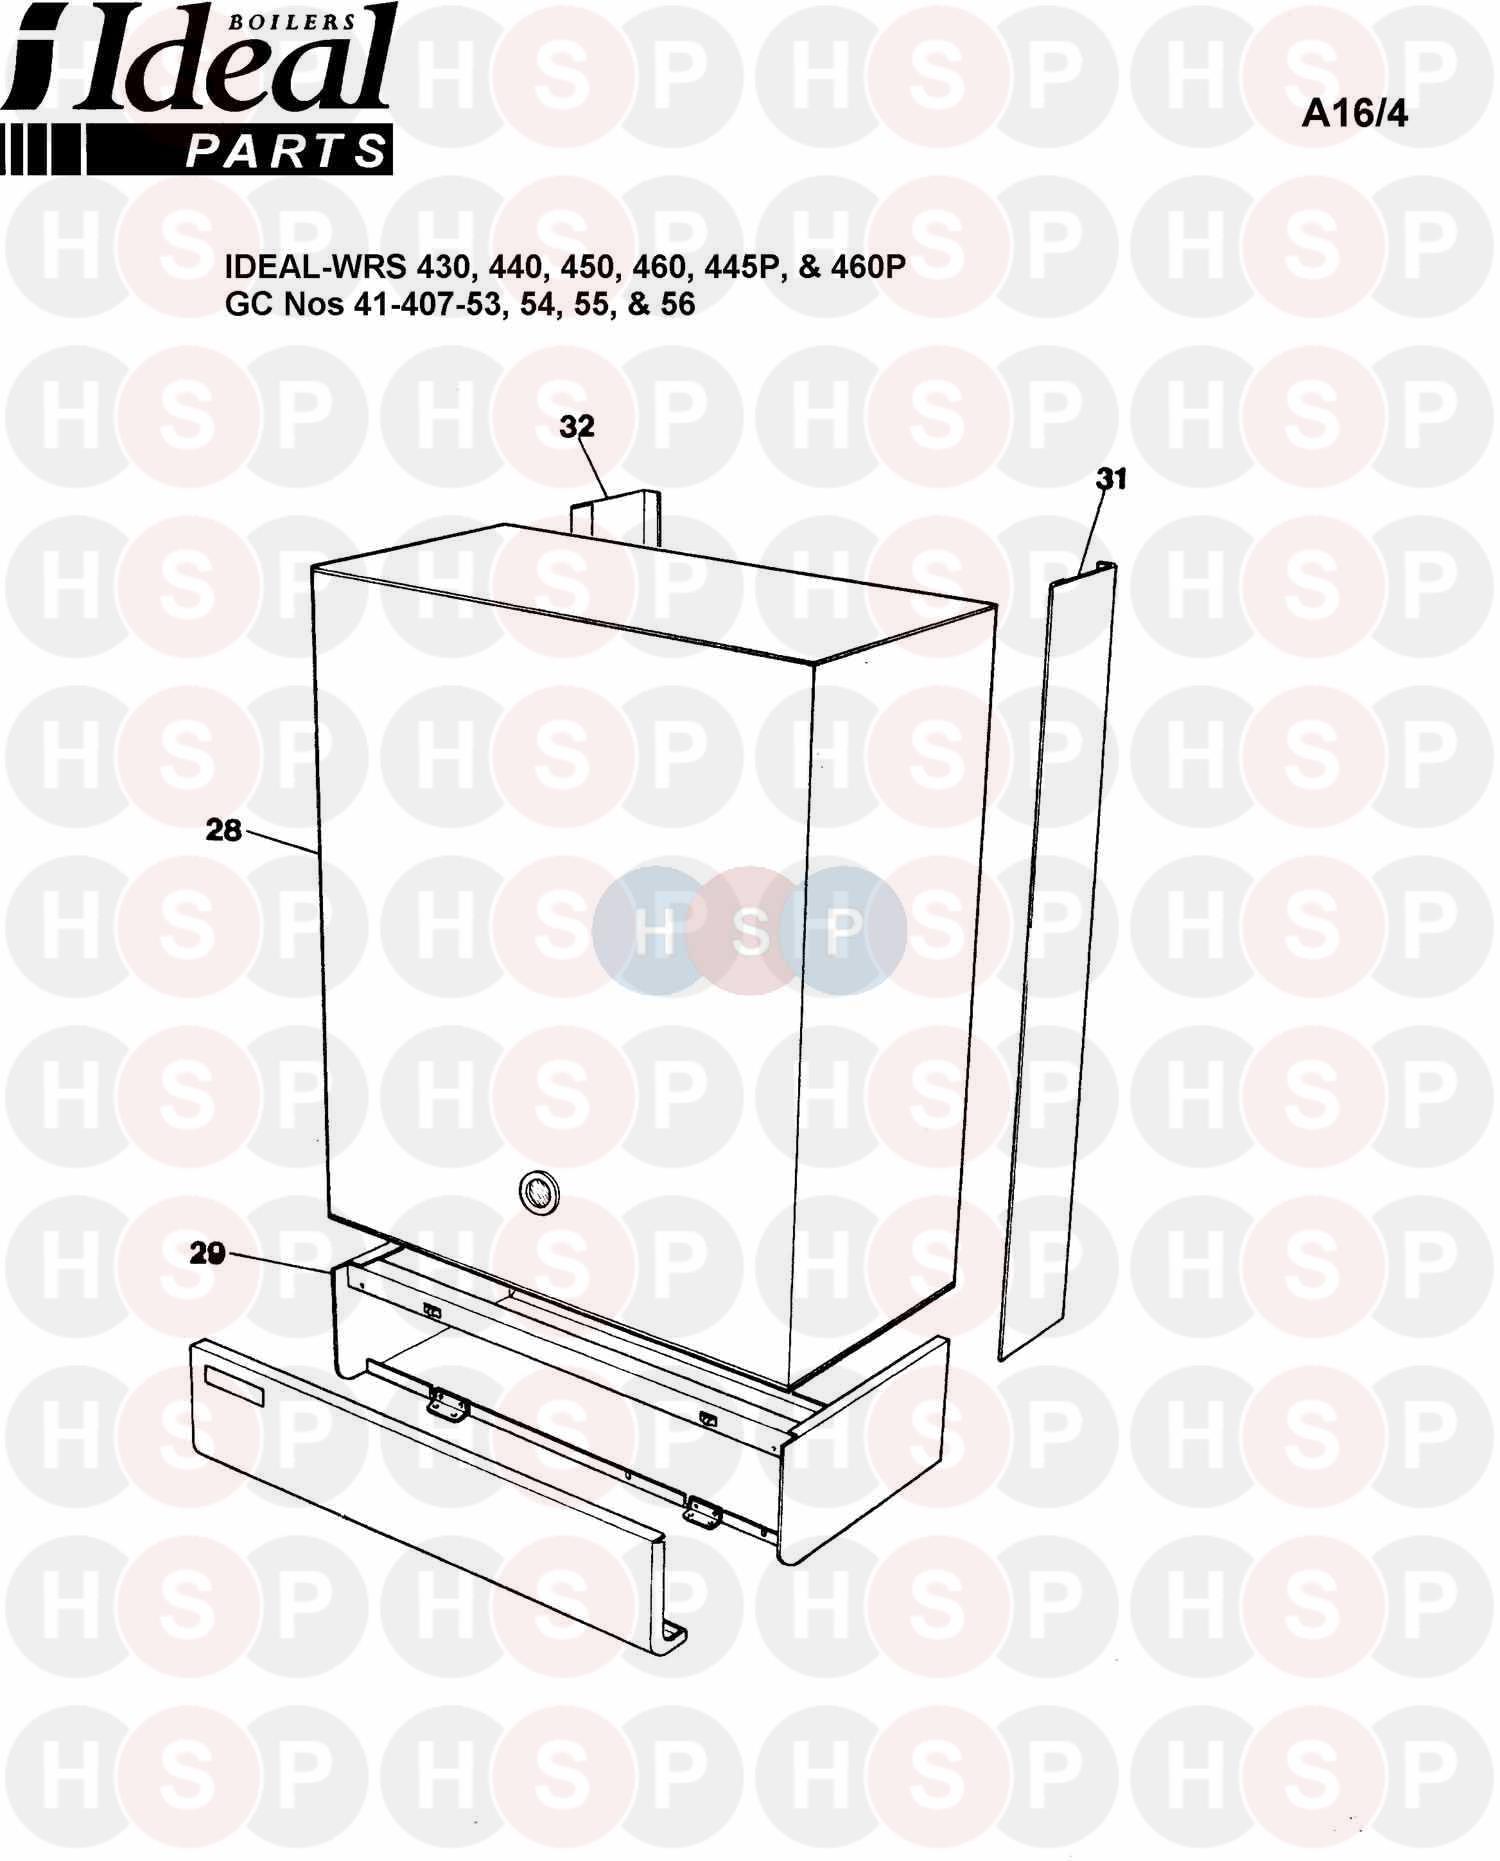 ideal concord wrs 460  boiler casing  diagram